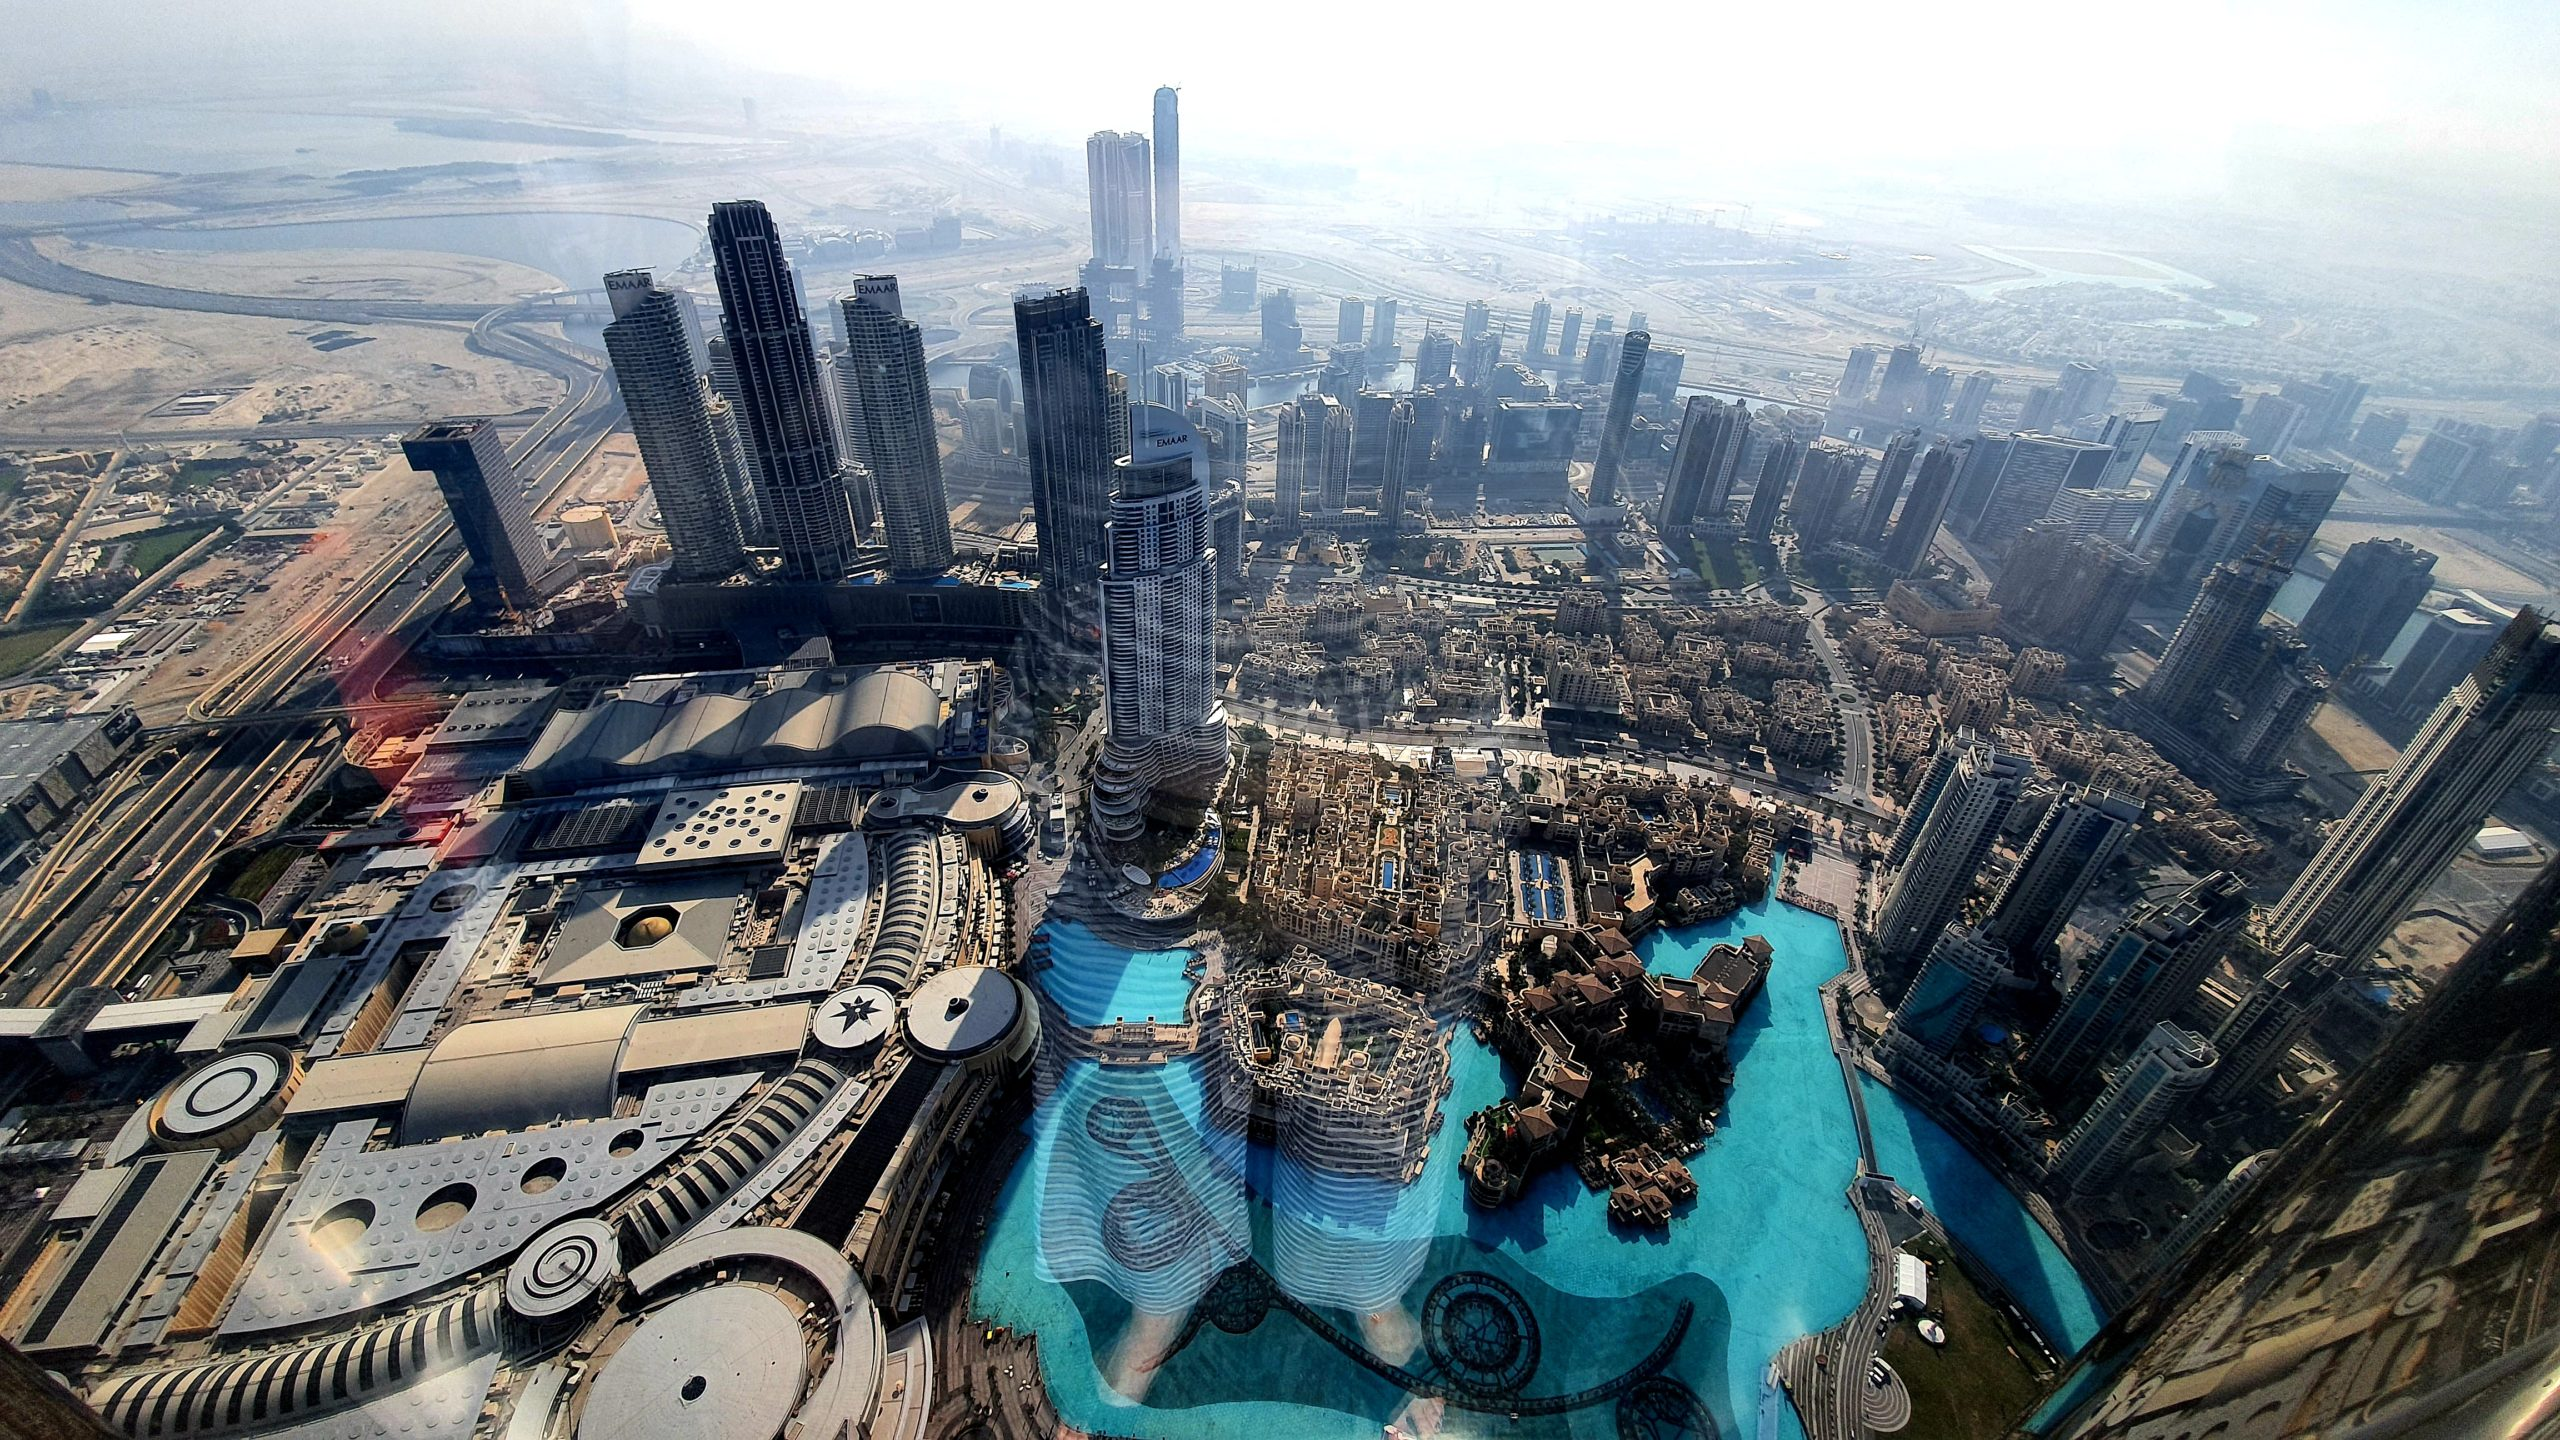 Burj Khalifa two days in Dubai